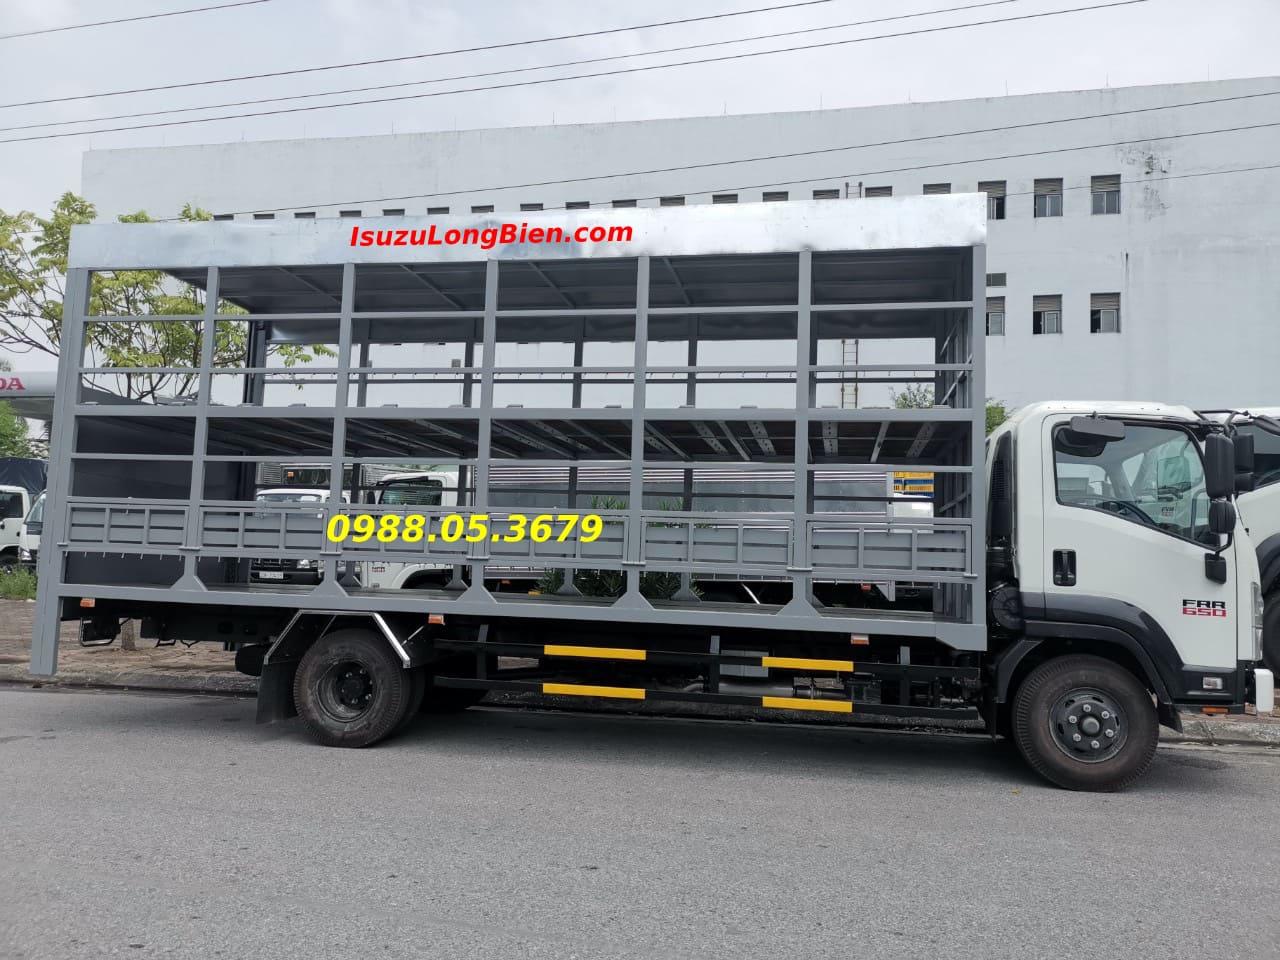 xe tai isuzu 6,5 tan frr 650 thung cho xe may 2 tang 6m7 frr90ne4